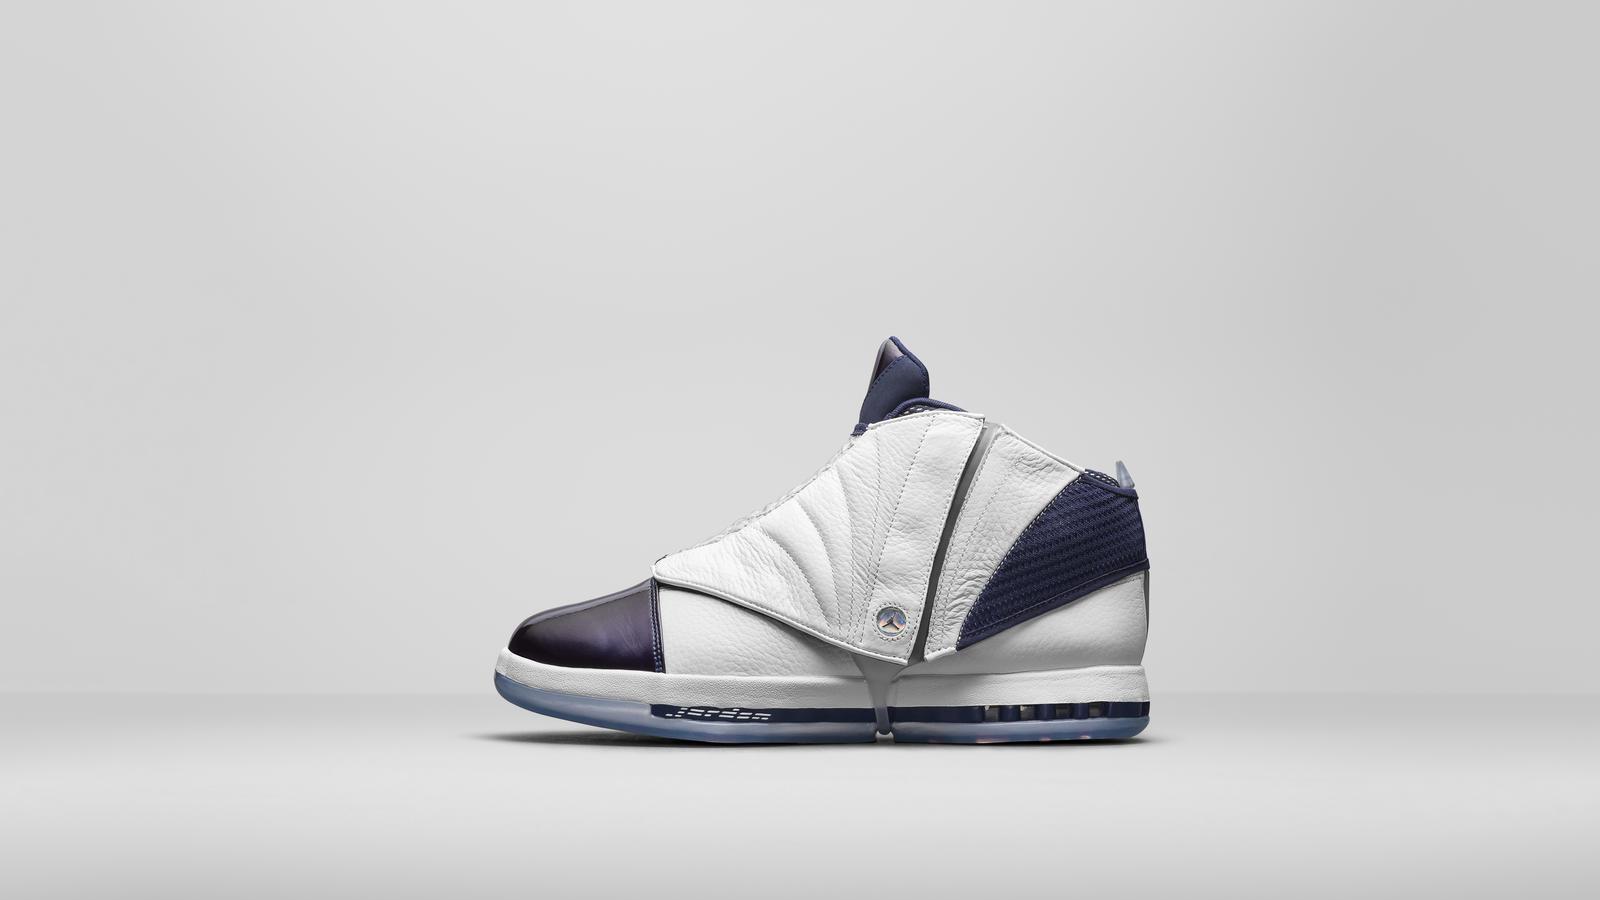 0940daaa91e1 Ray Allen Recalls the Air Jordan XVI - Nike News